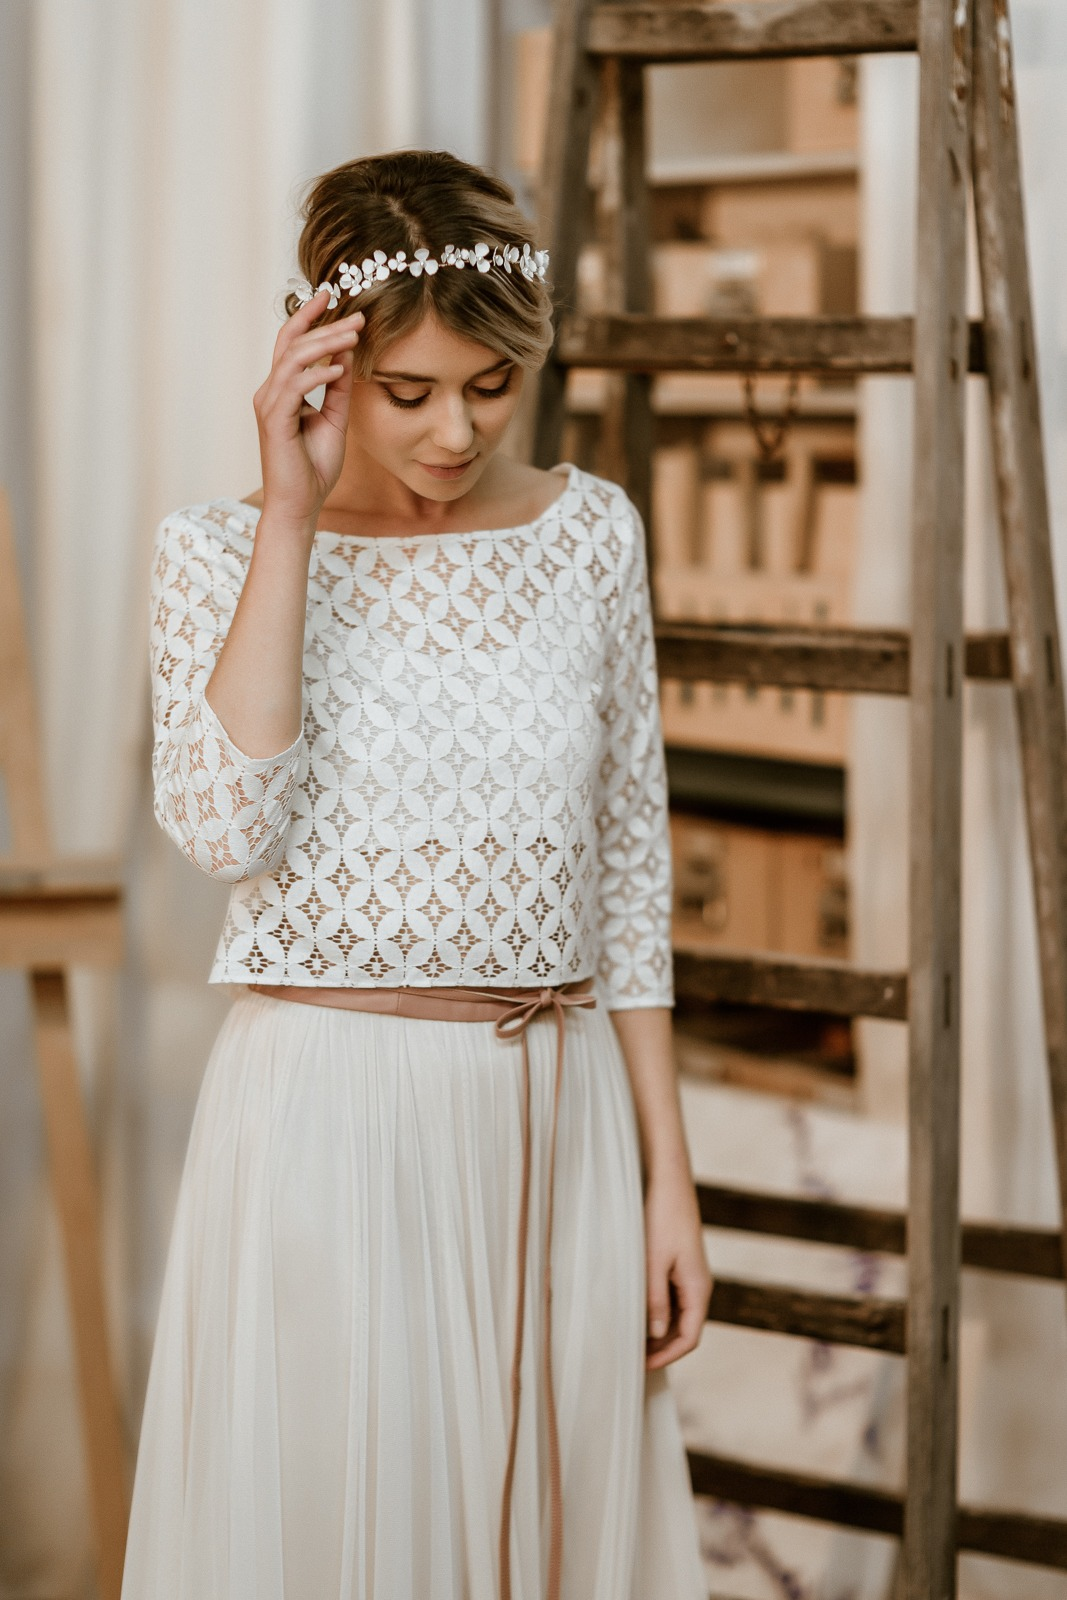 noni Jubiläumskollektion | Braut-Spitzentop mit geometrischem Muster mit langem Tüllrock in Blush (Foto: Le Hai Linh)